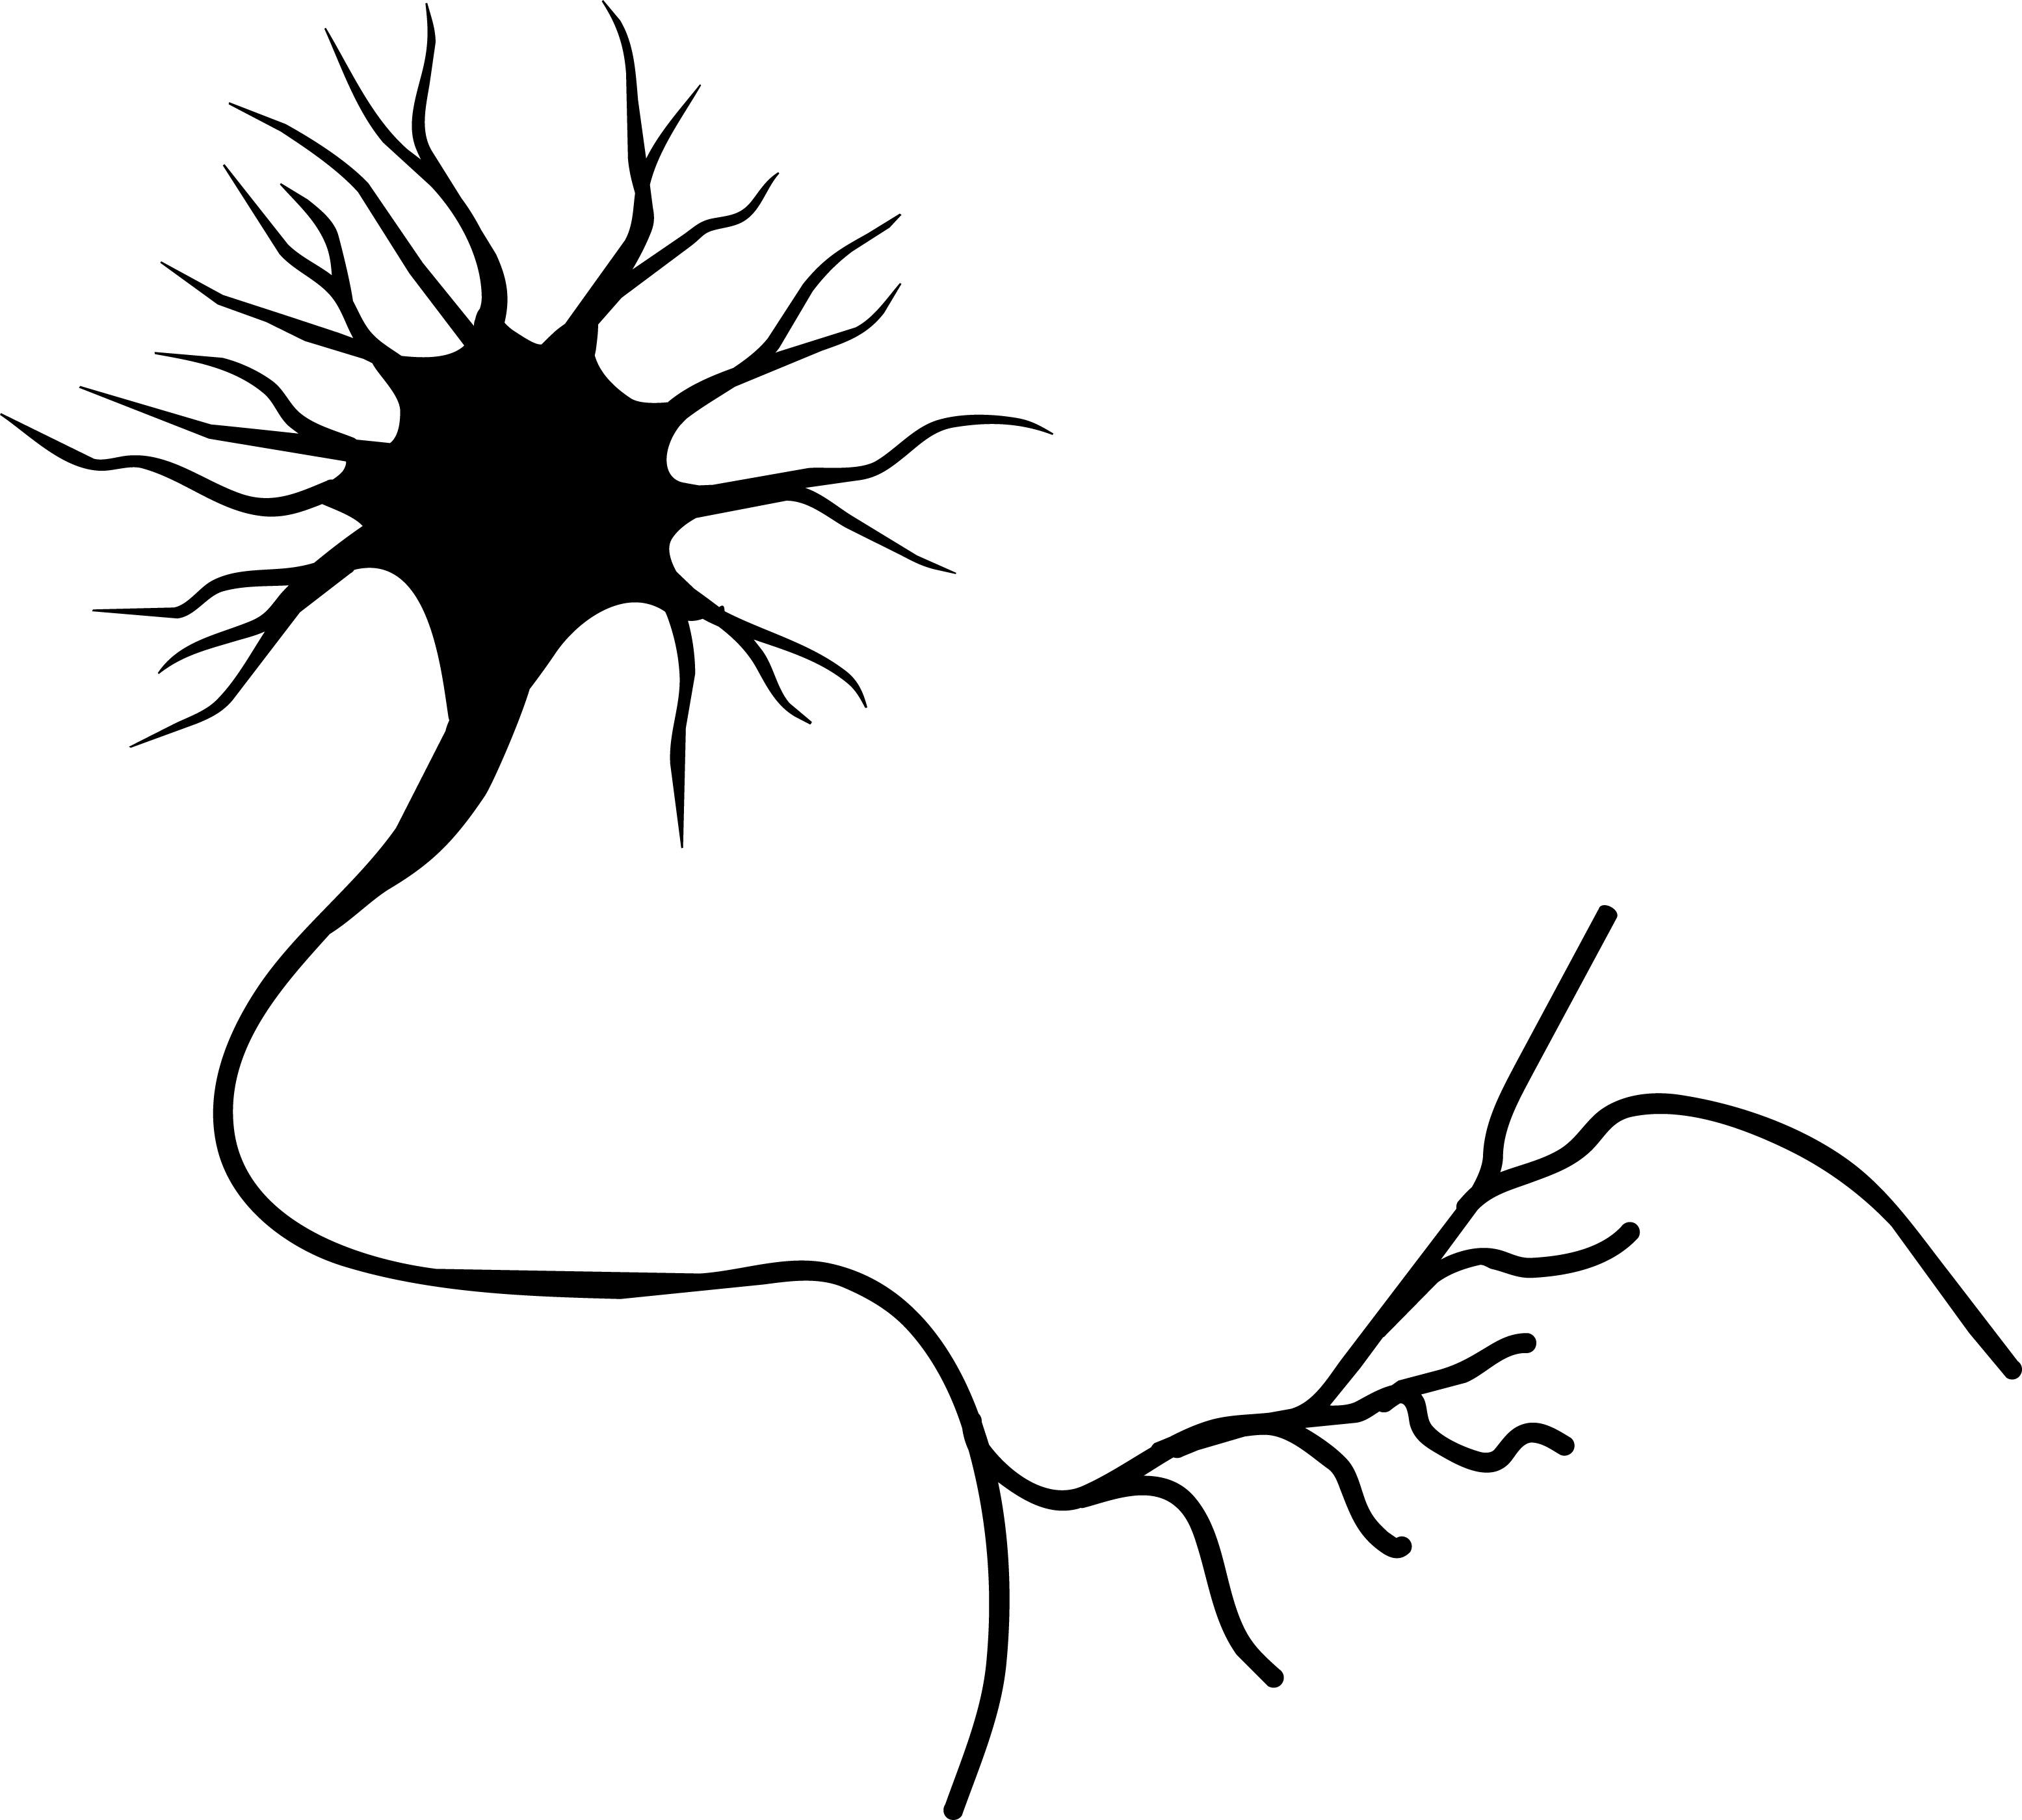 Neuron clipart unipolar 20clipart neuron%20clipart Panda Clipart Images